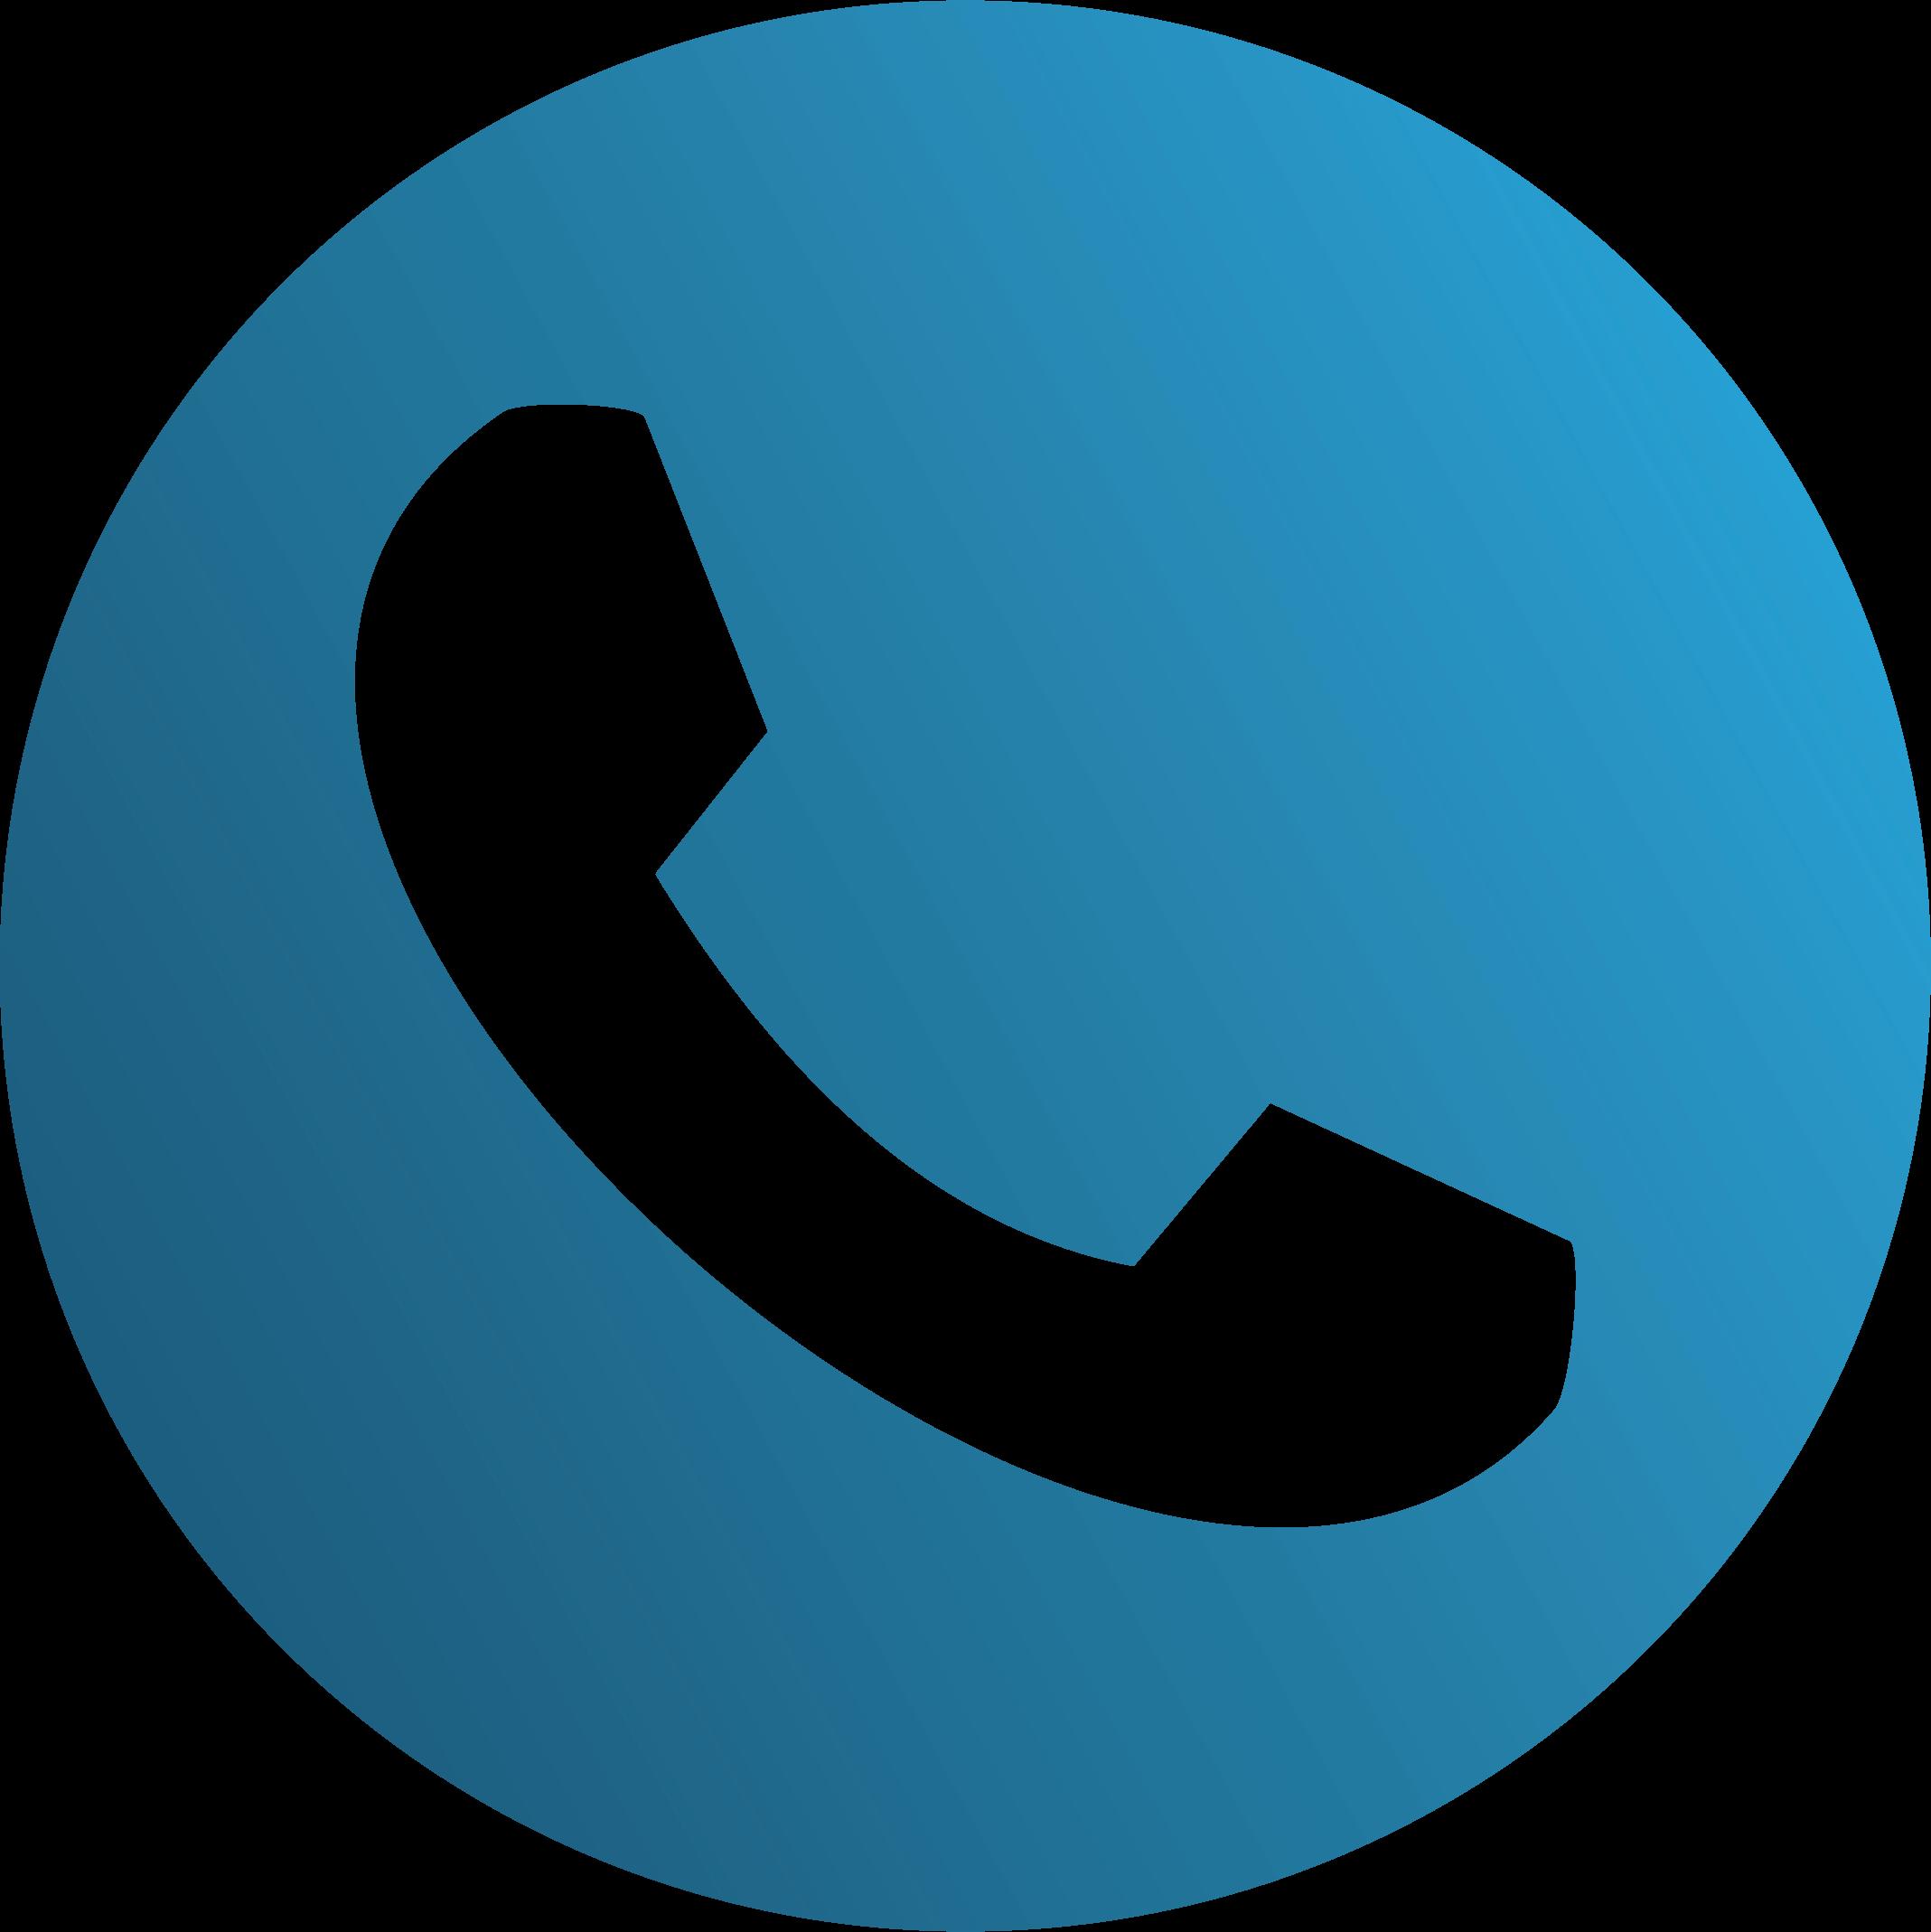 Phone Icaon